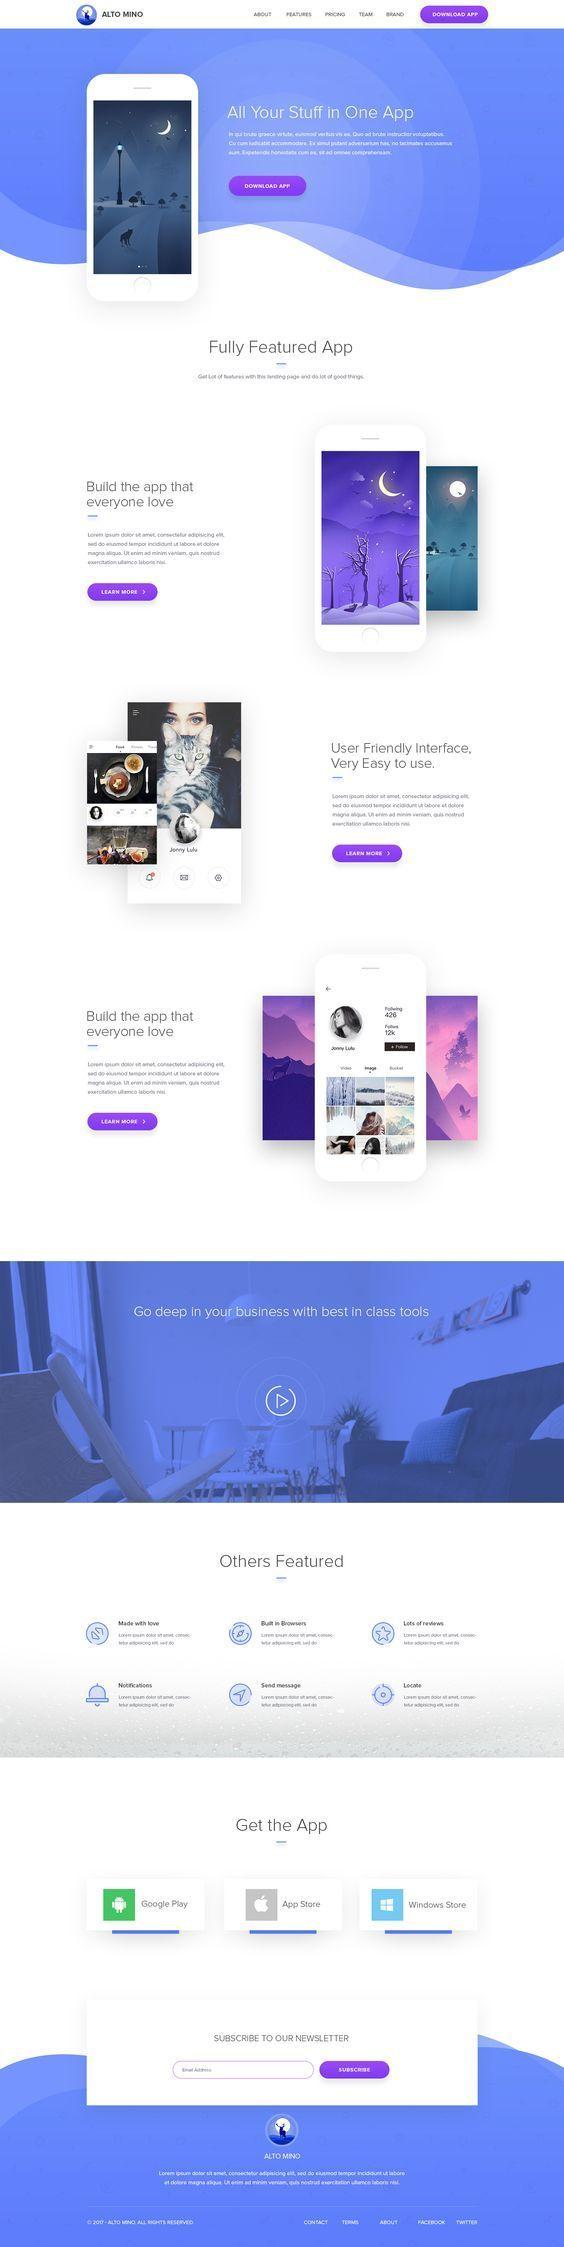 We are leading agency in web app designs. #webappdesign #UIprototyping #websiteUIdesign #websitedesigns #webdesignportfolio